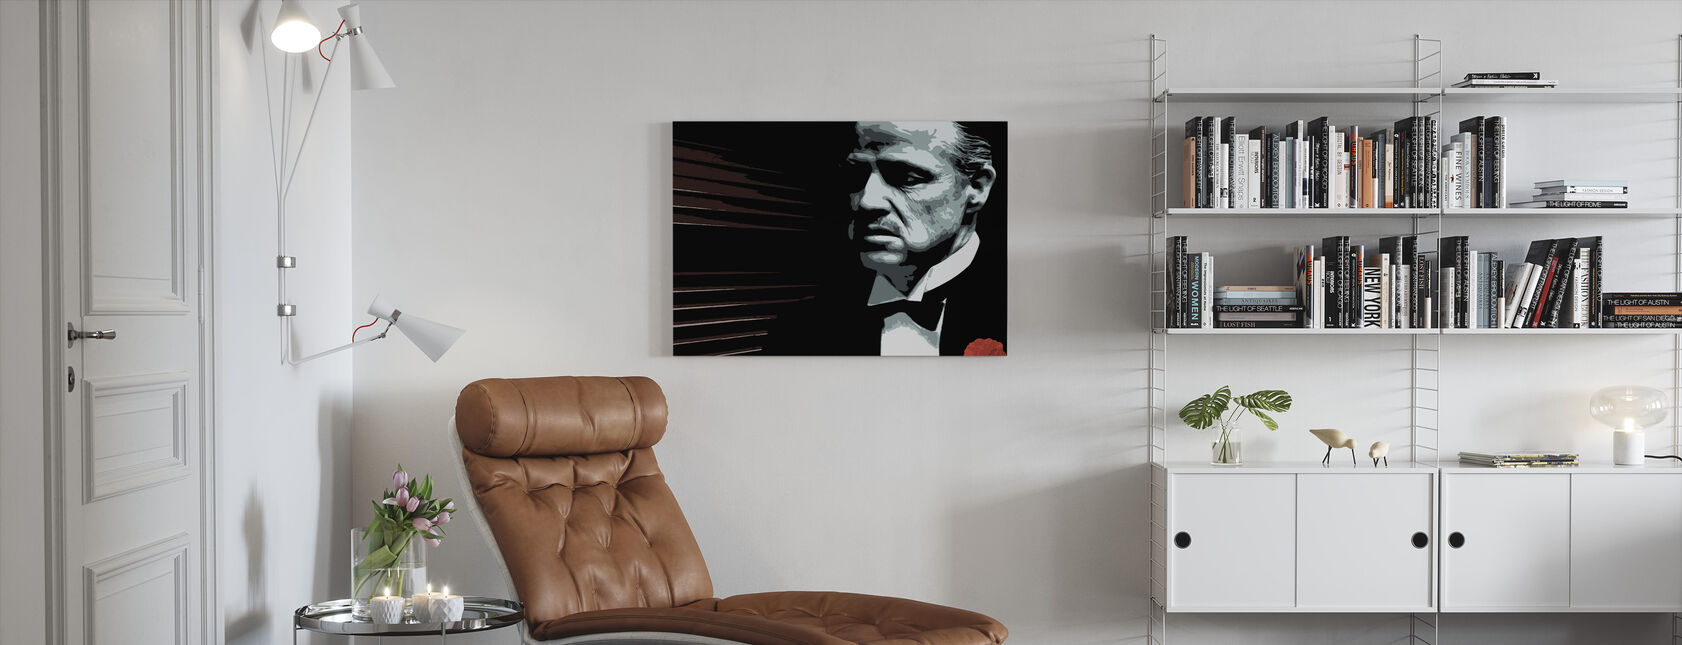 Don Vito - Canvastavla - Vardagsrum